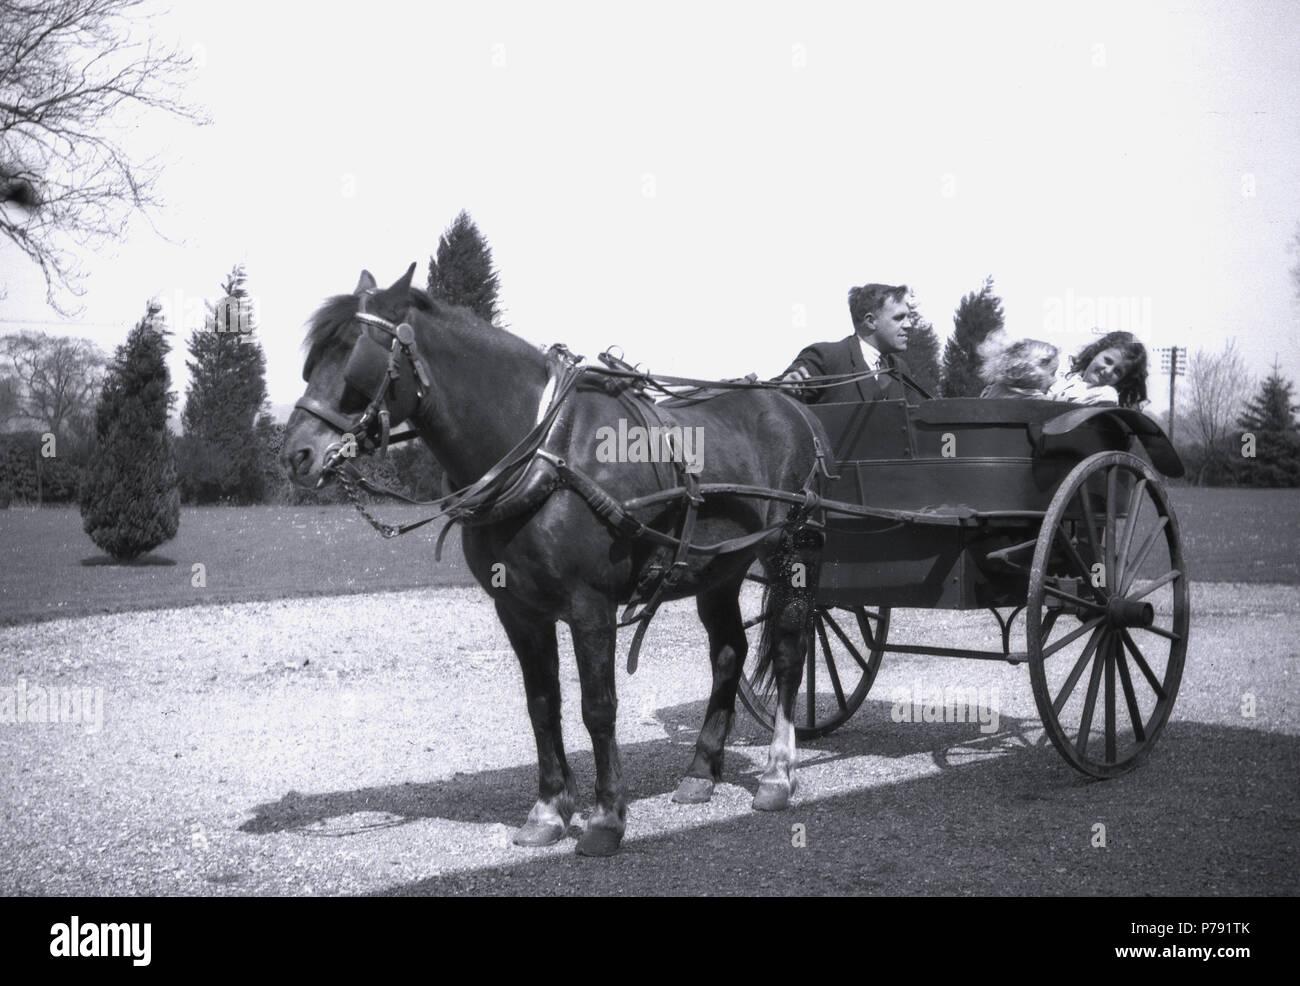 two wheeled horse drawn carriage stock photos two wheeled horse